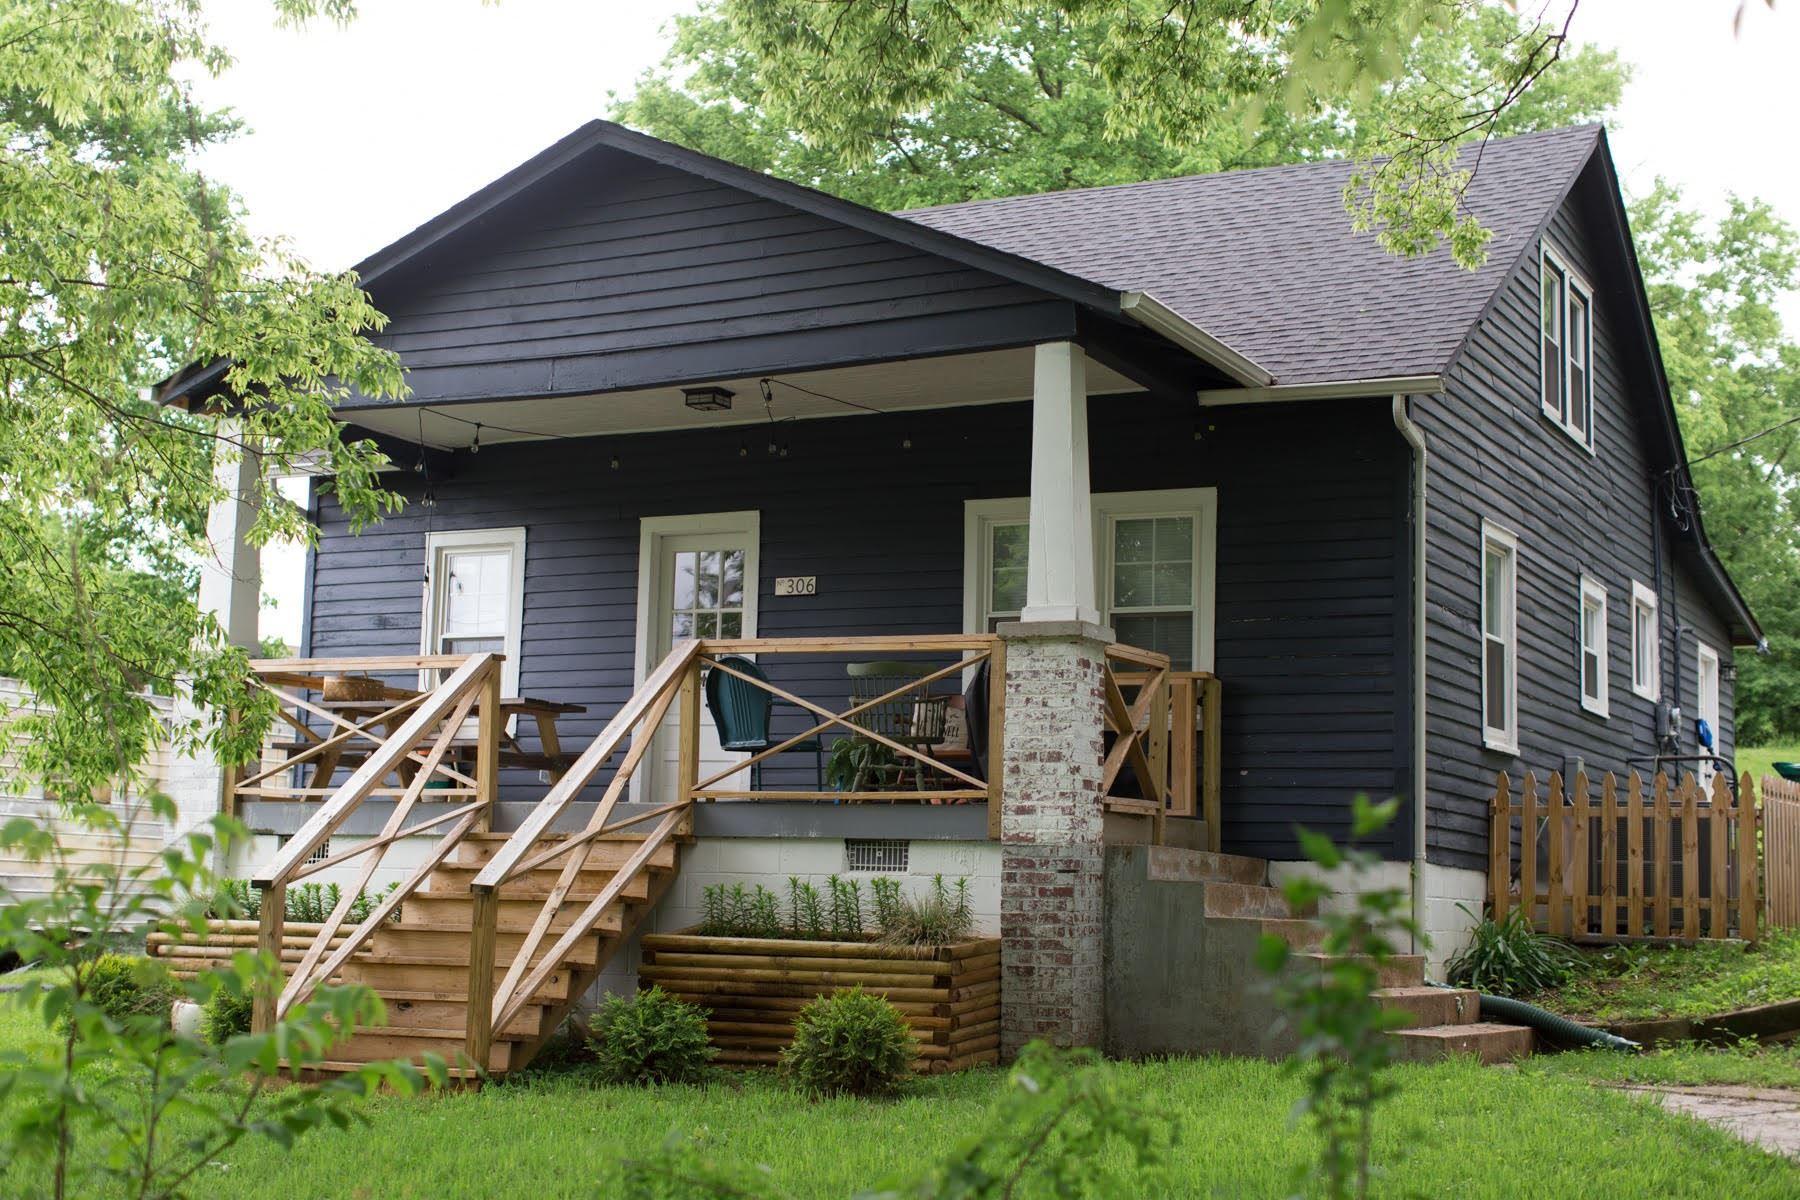 306 E St, Clarksville, TN 37040 - MLS#: 2251259